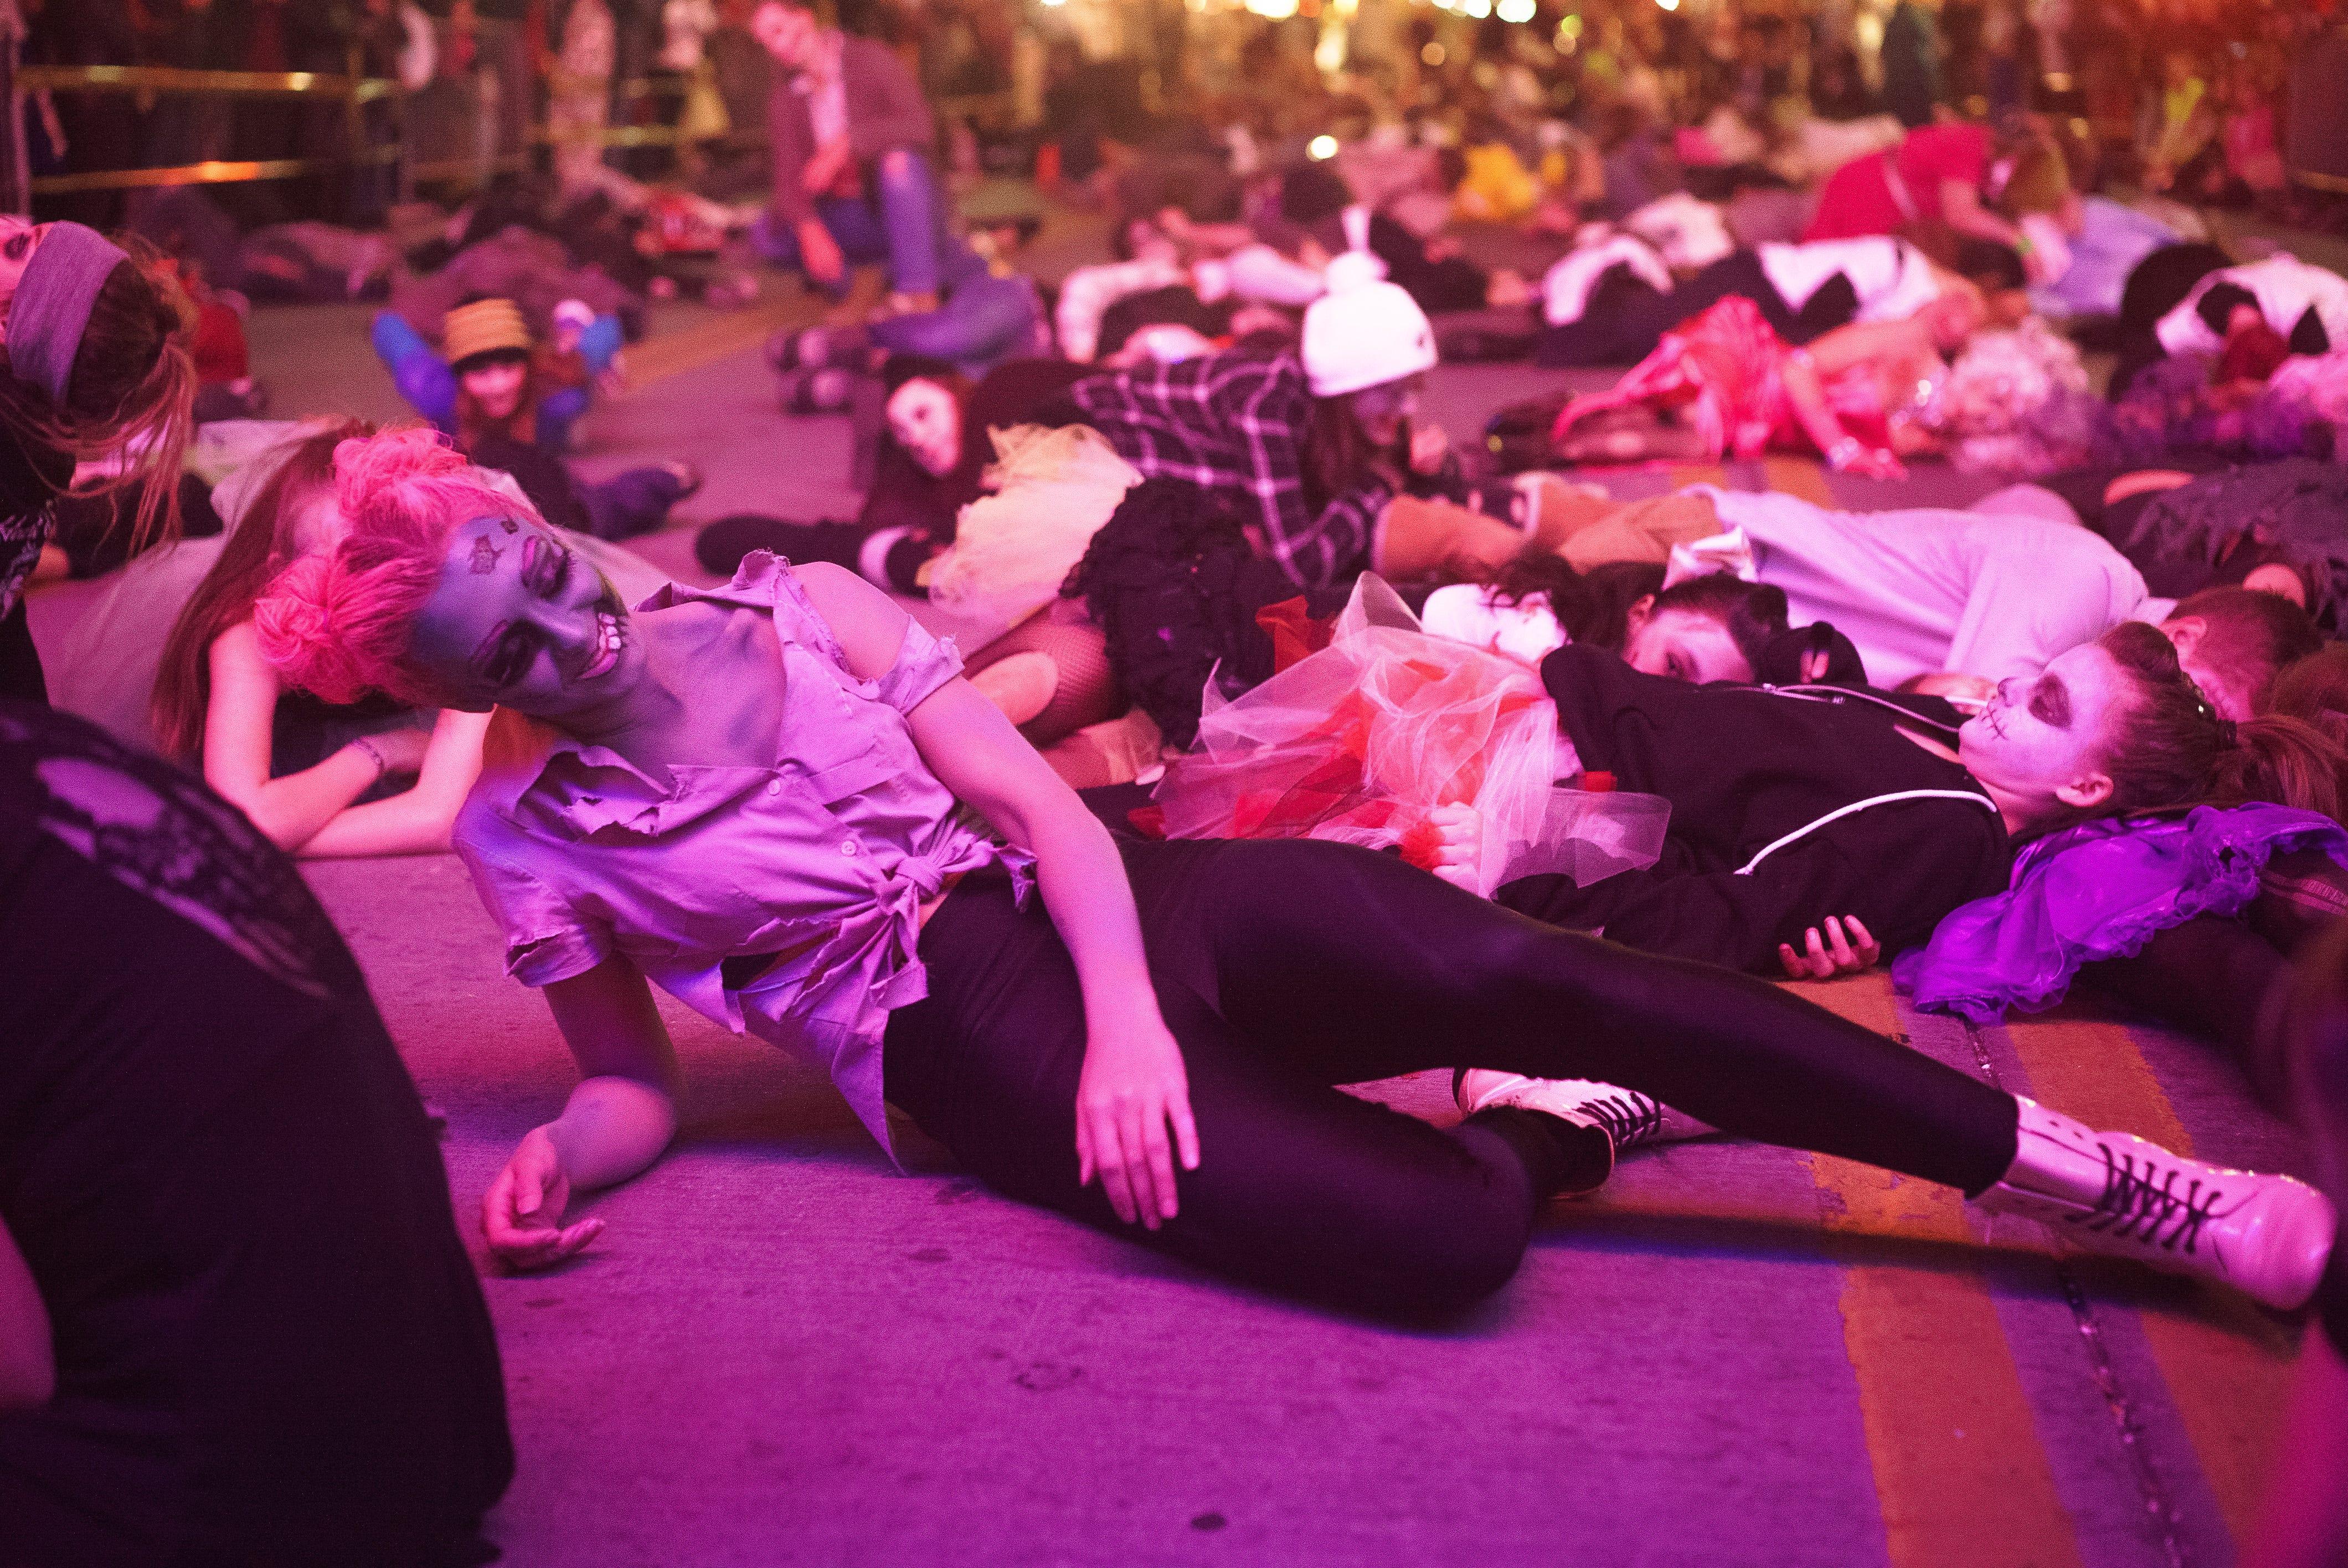 Reno roads: Zombies will block streets Saturday night | Reno Gazette Journal